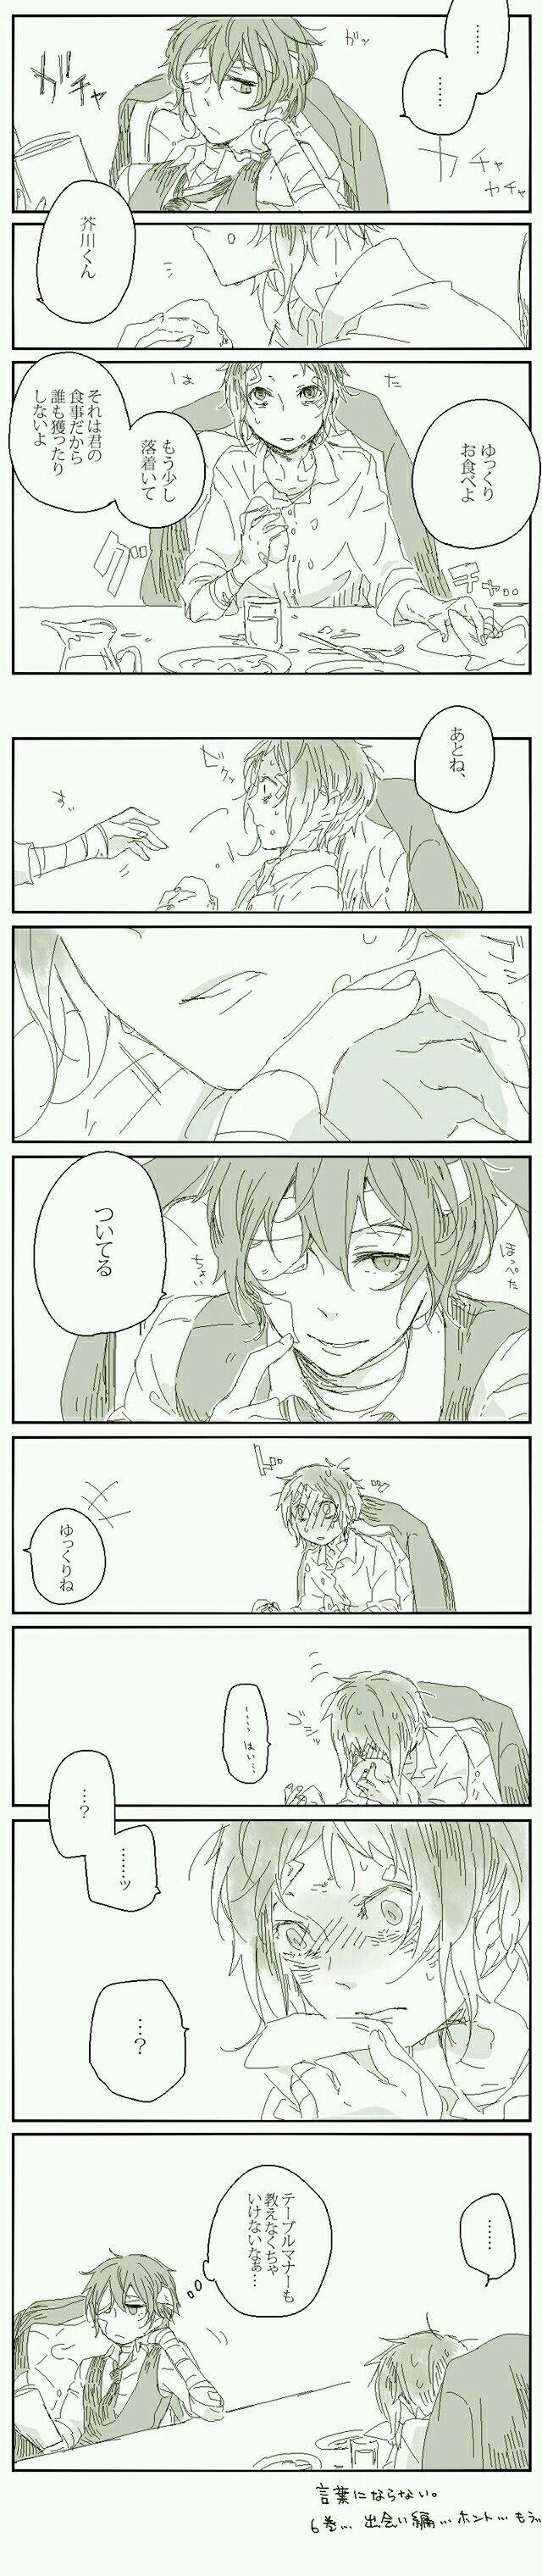 I just pin this 'coz it makes sense if Akutagawa at some point had mentor crush on Dazai <3